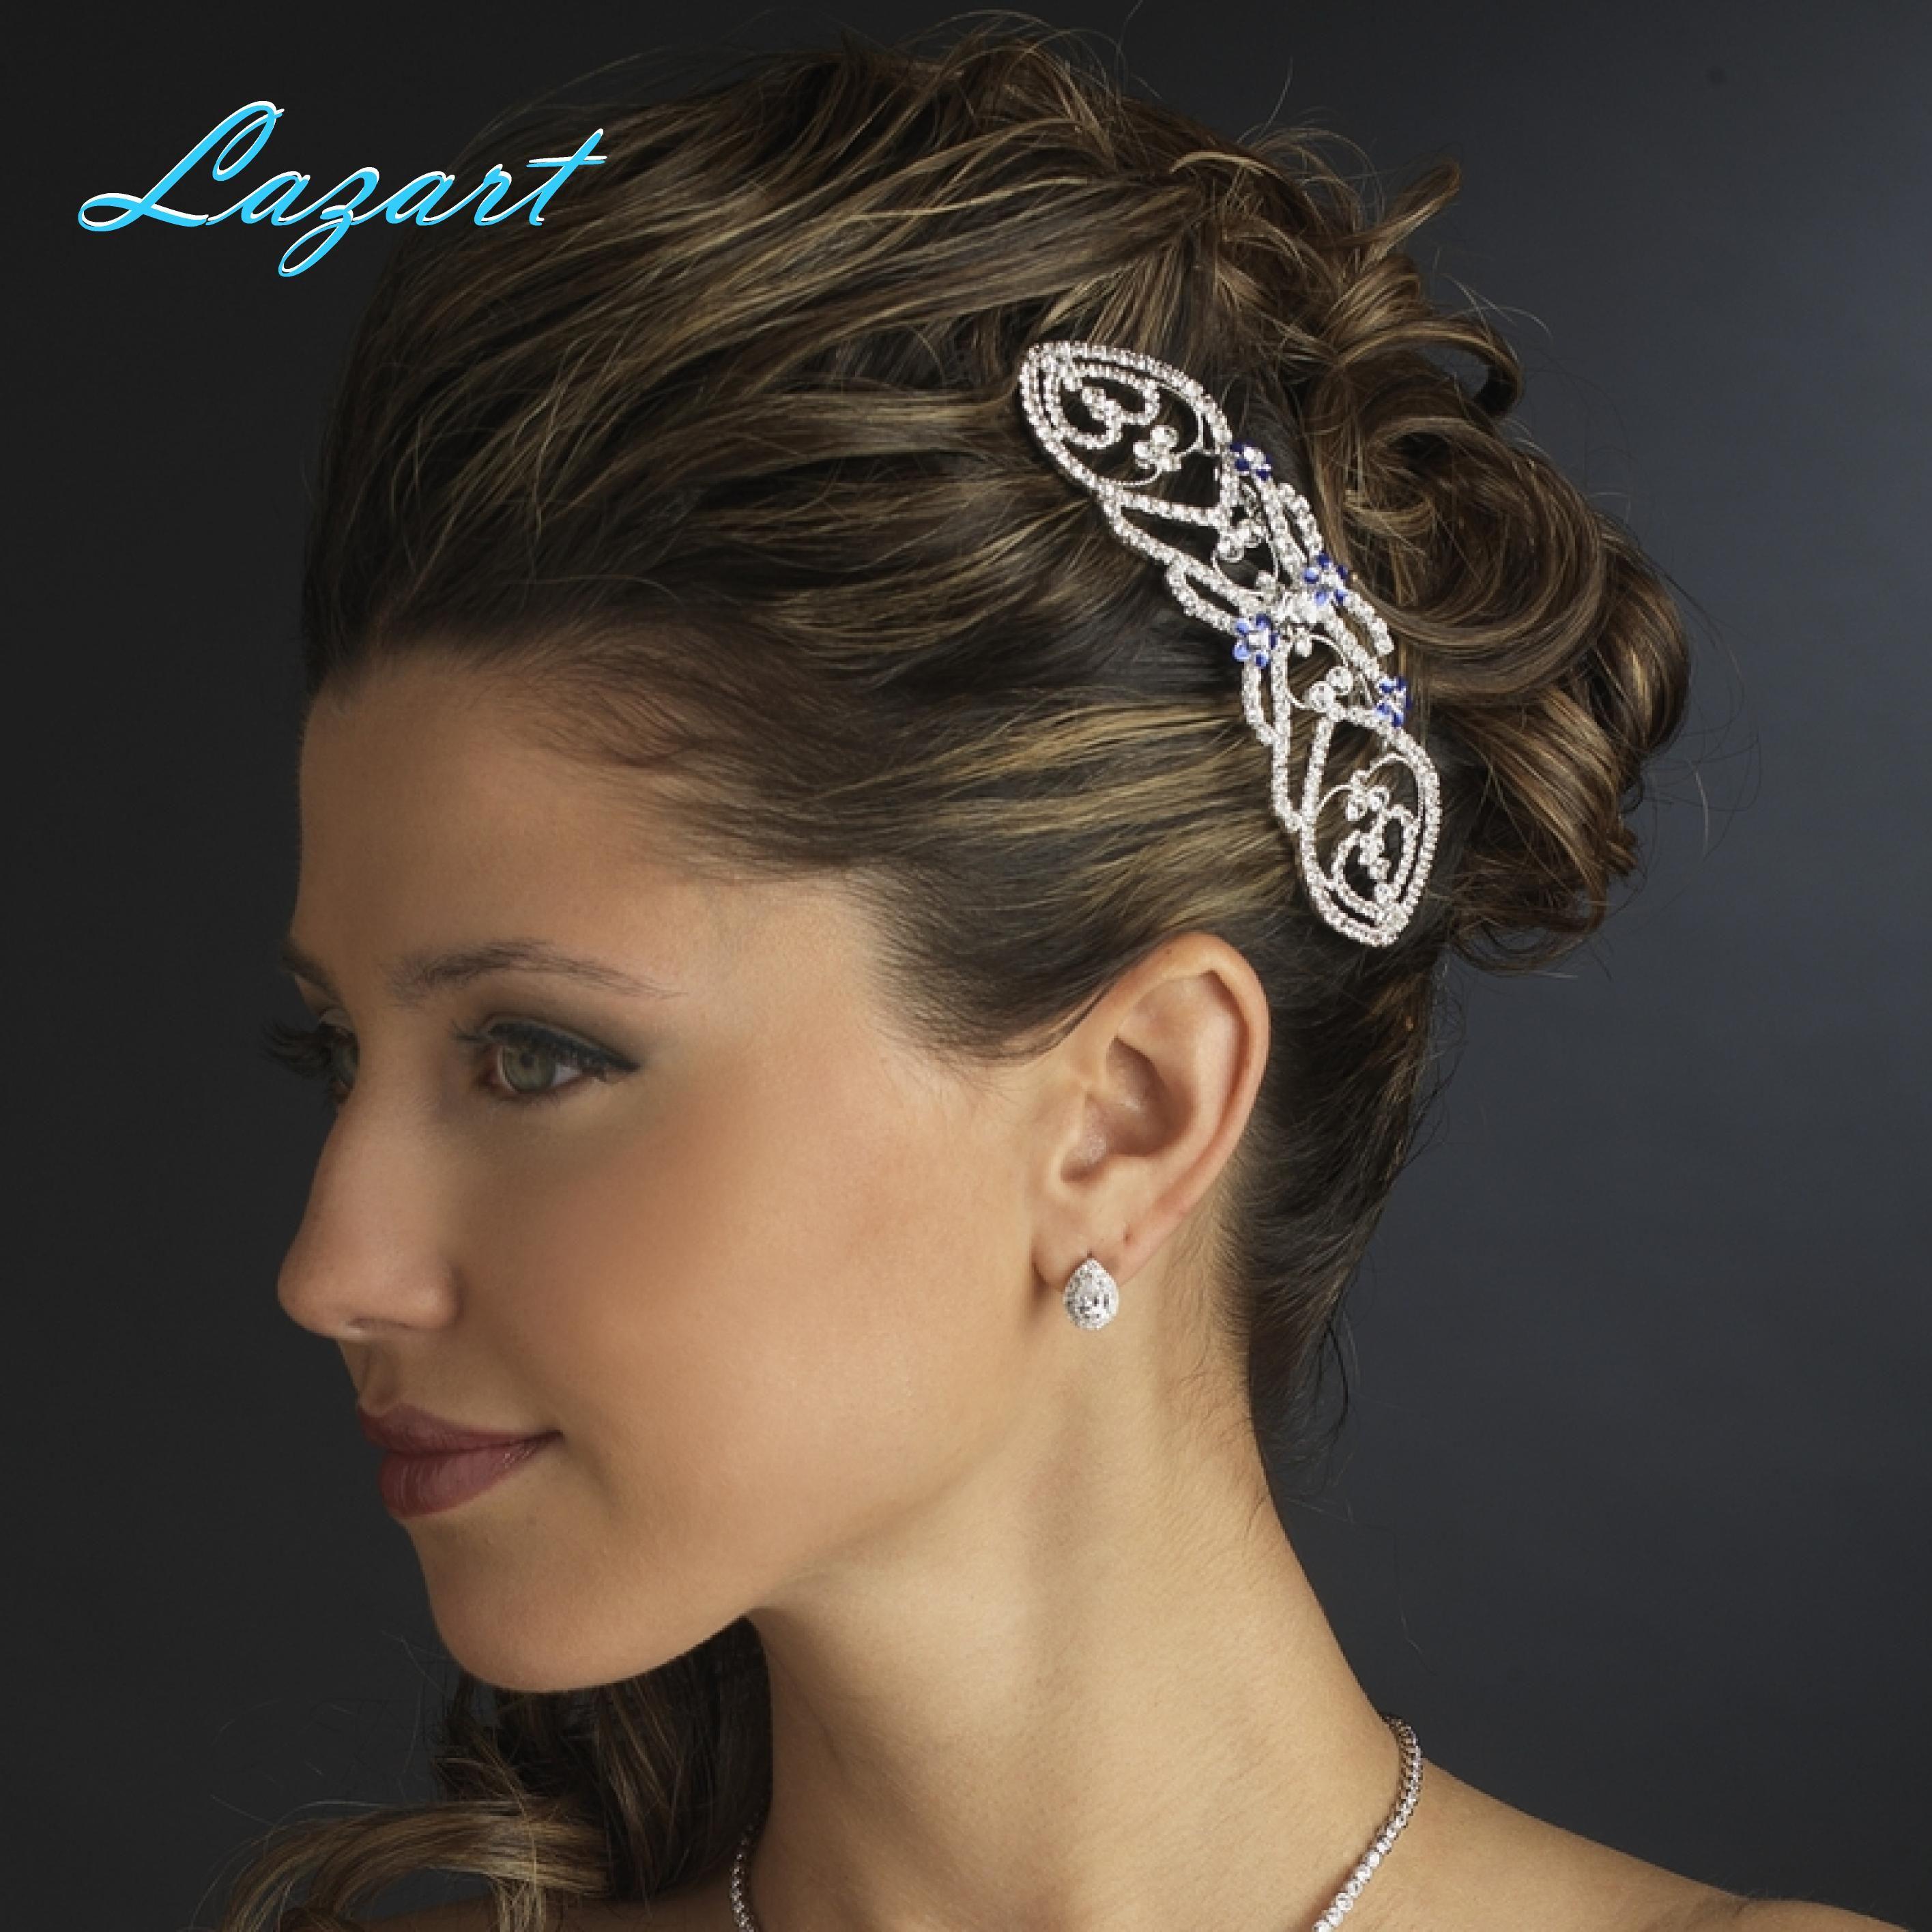 bella headpiece from twilight #headpiece #comb #bride #lazart